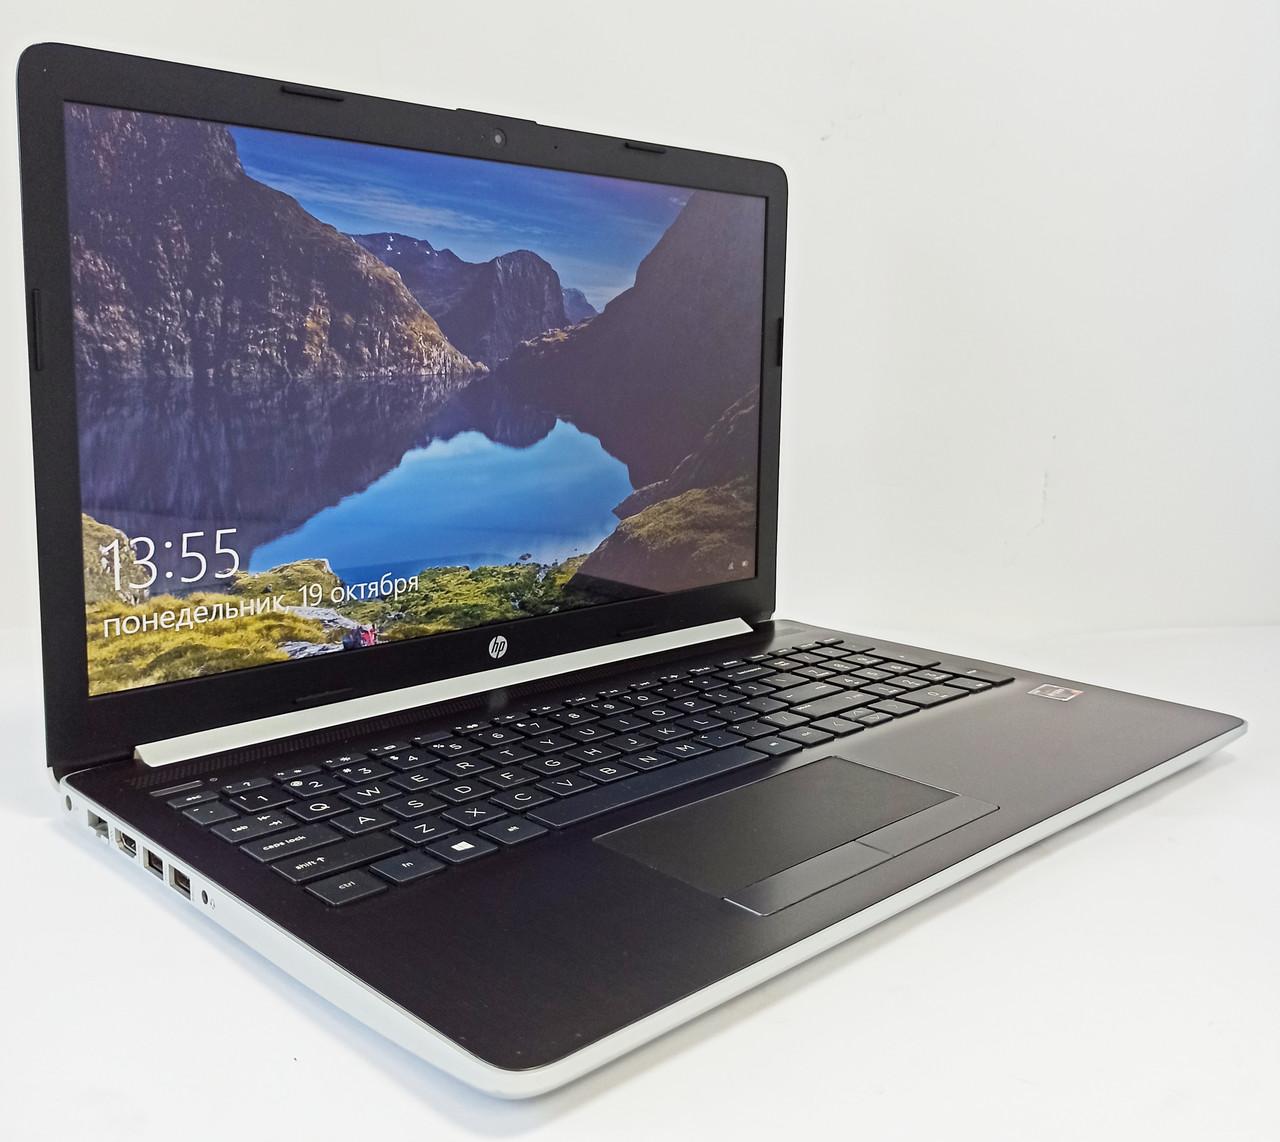 "Ноутбук HP 15-db0005dx (Multitouch/15.6""/Ryzen 5 2500U/8Gb/128Gb SSD) БУ"